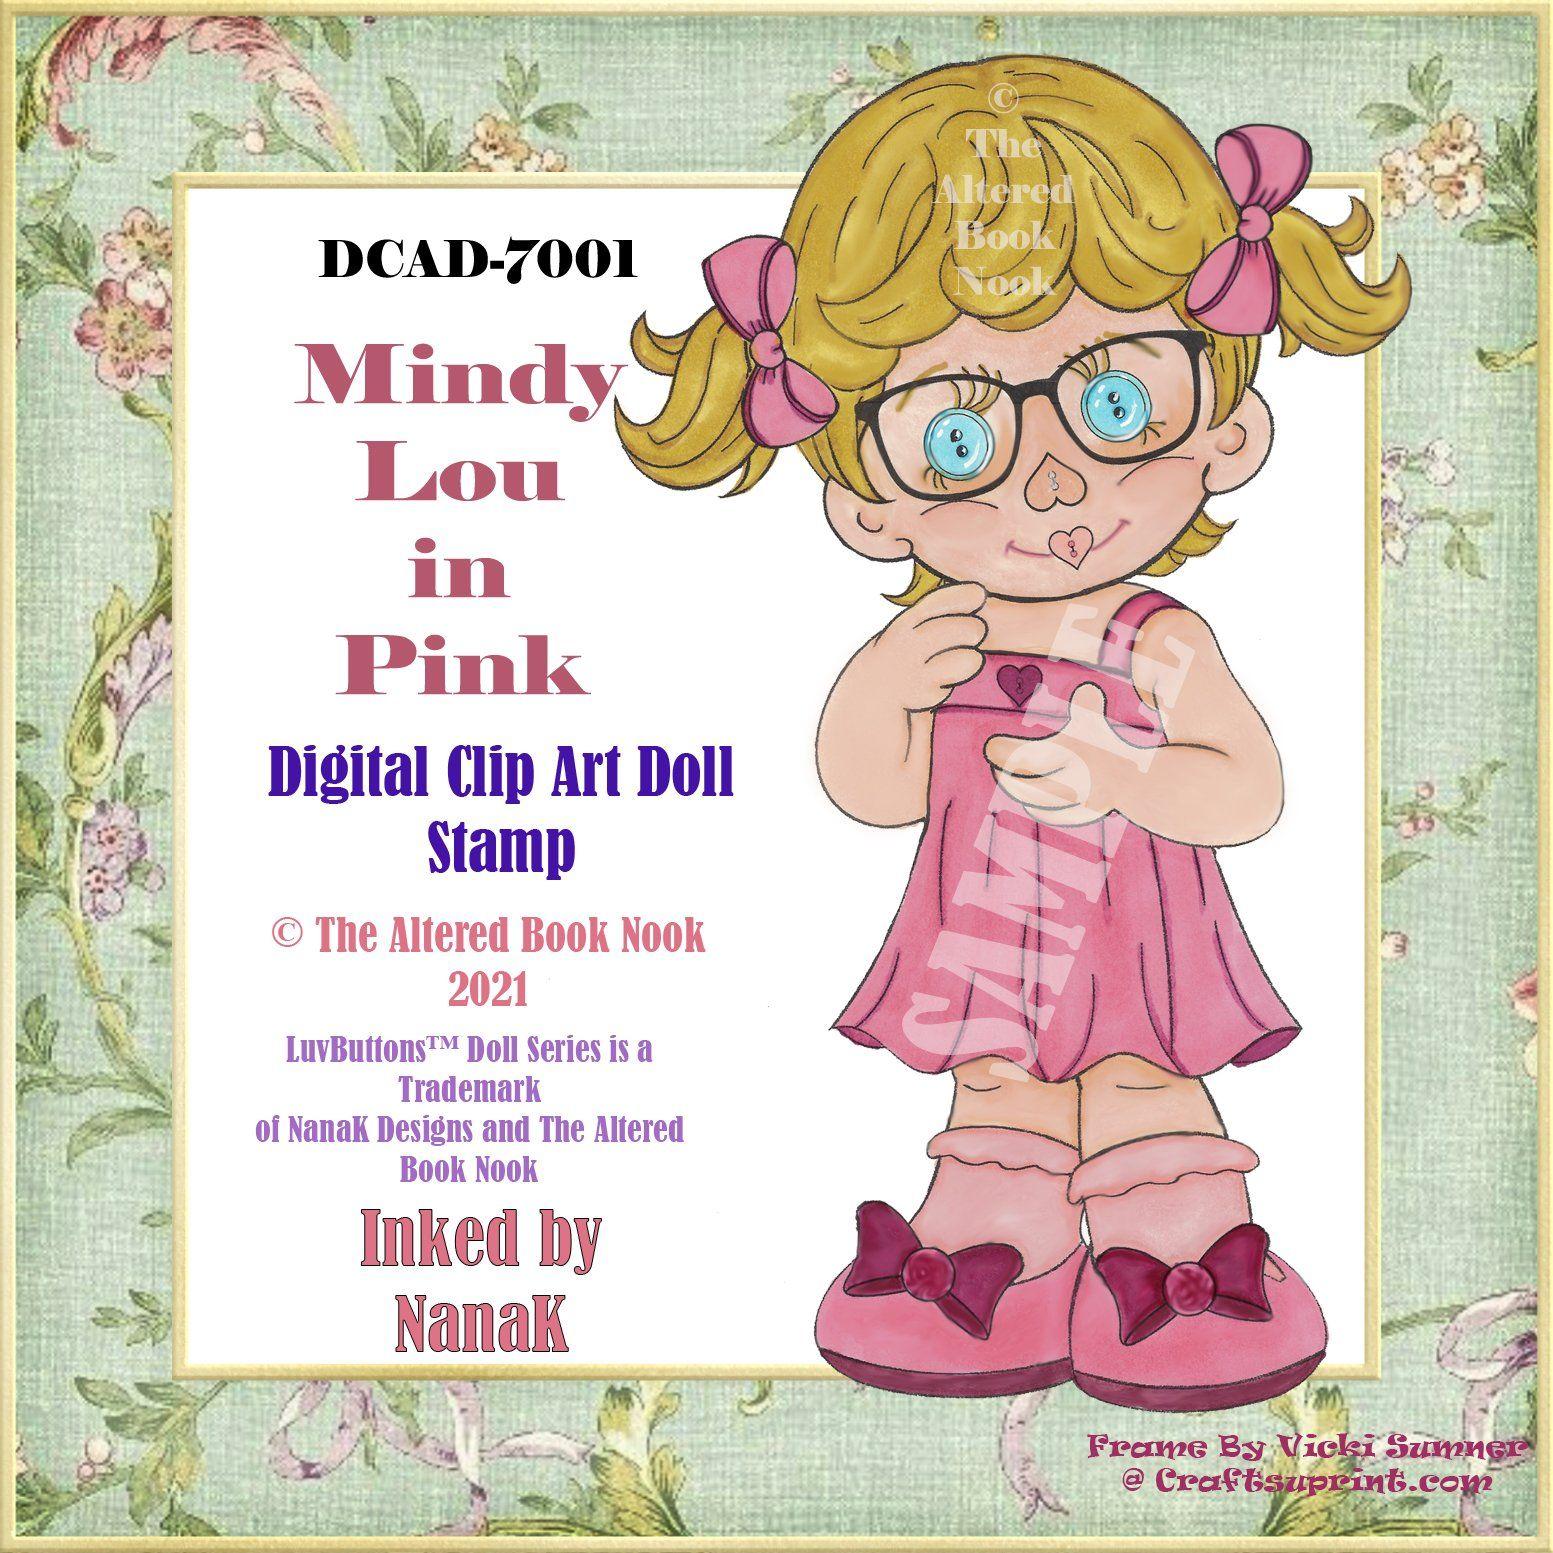 DCAD-7001, Digital Doll Stamp, Colored Doll Stamp, Junk Journal Clip Art, Clip Art, Tag Art, Mindy Lou LuvButtons©